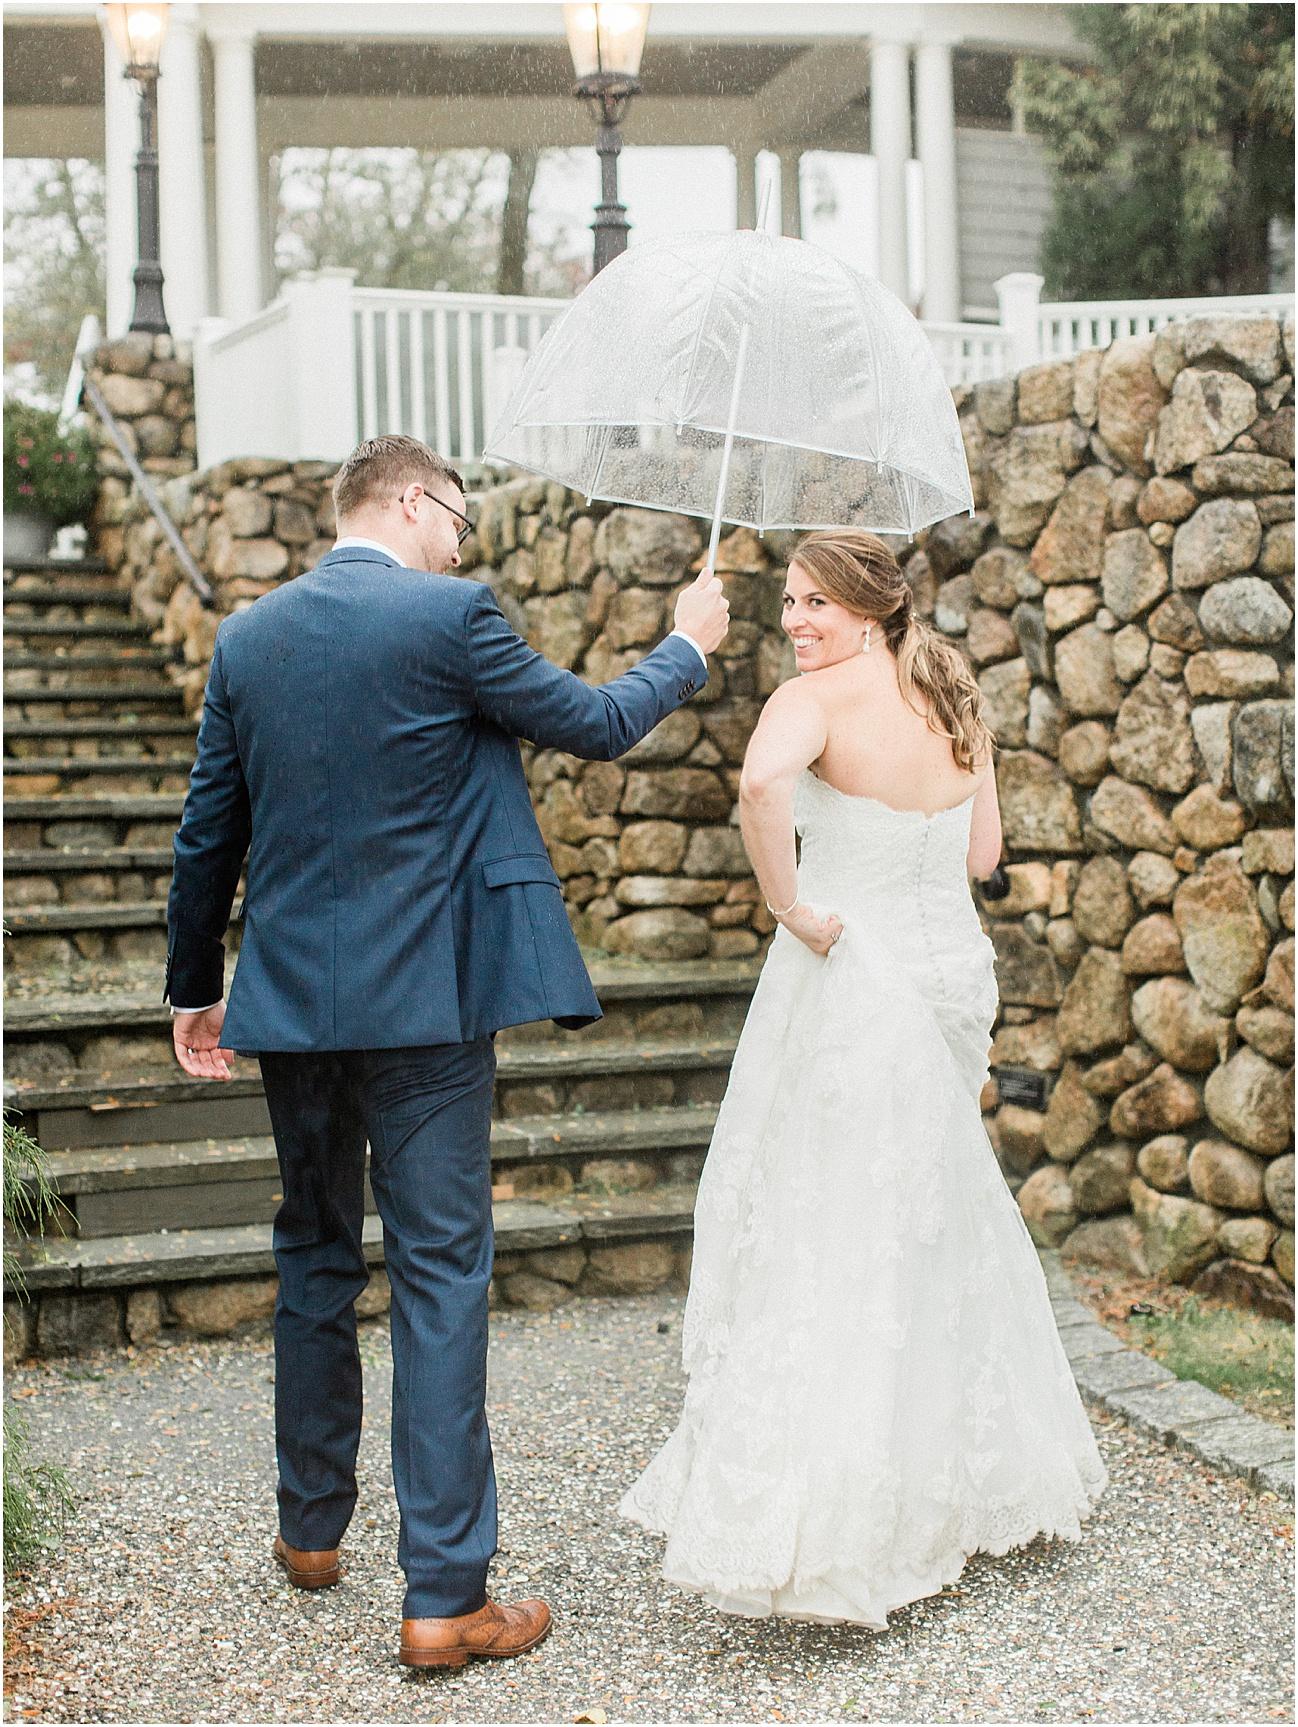 danielle_sean_willowbend_rain_rainy_day_cape_cod_boston_wedding_photographer_meredith_jane_photography_photo_1685.jpg